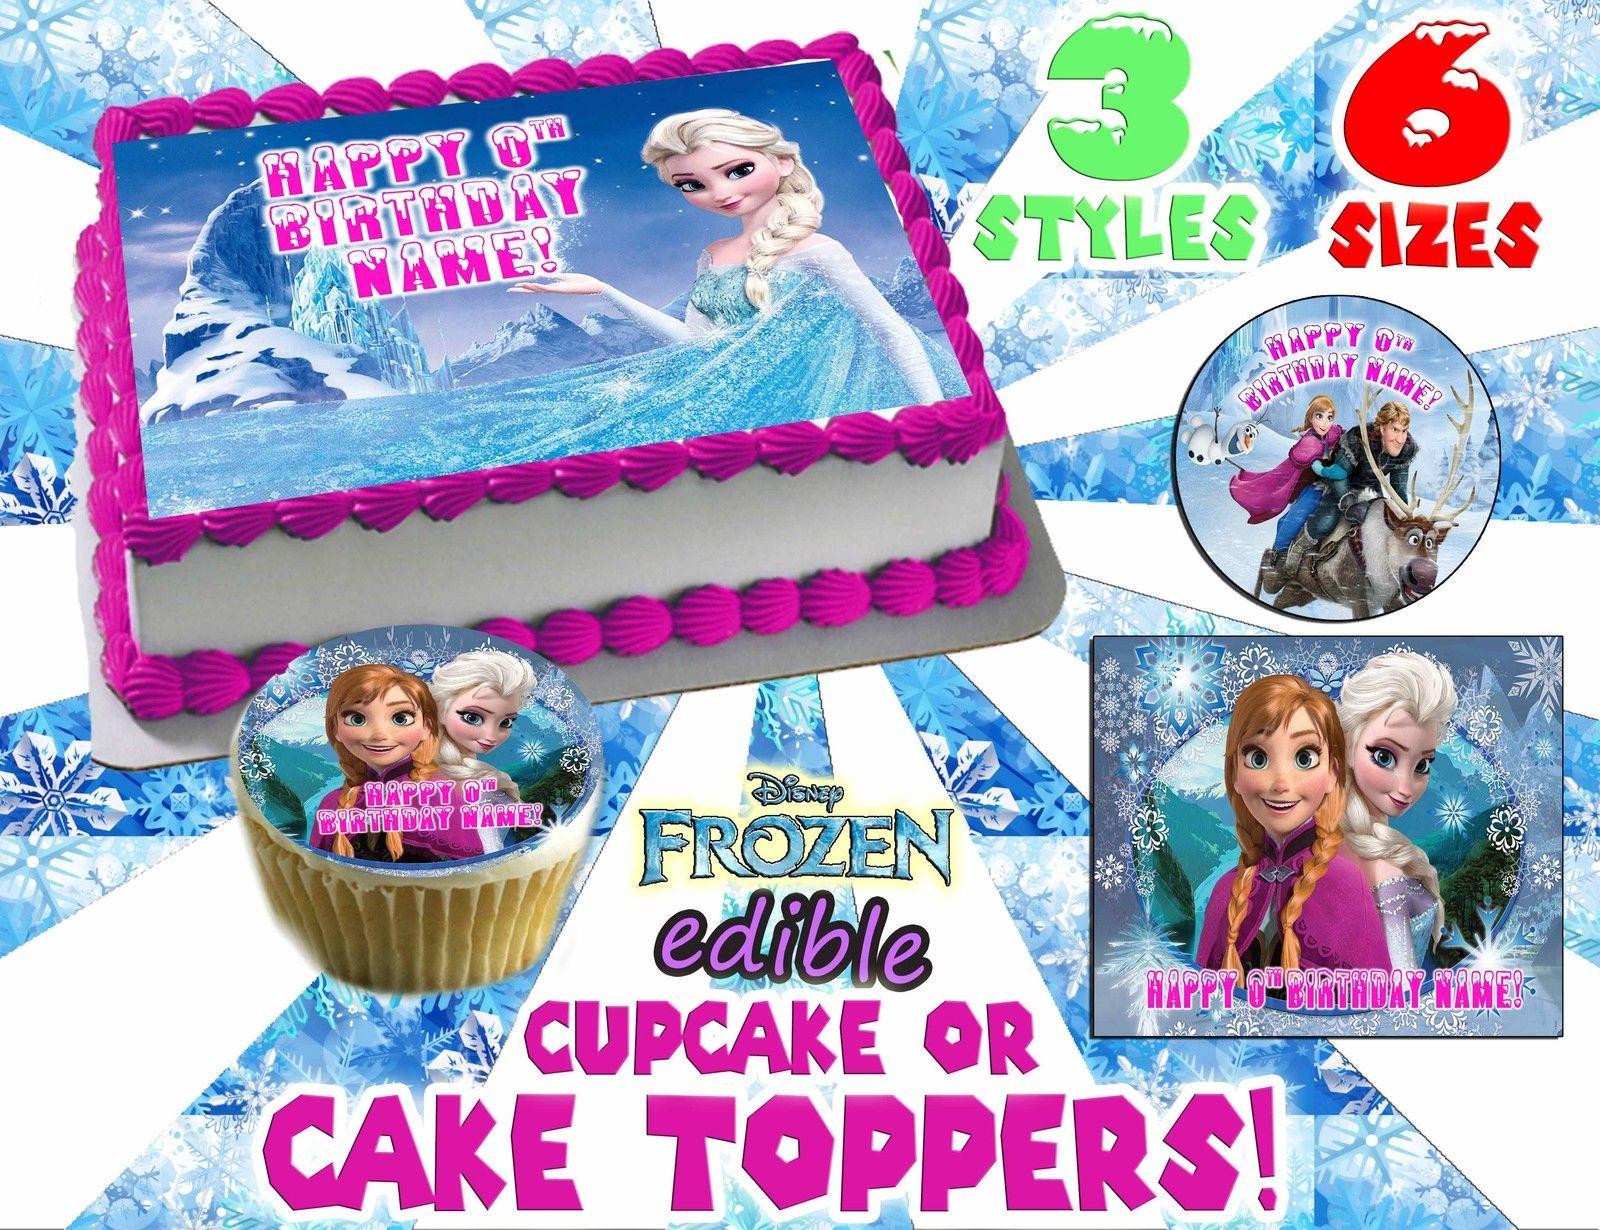 Cake Toppers Disney S Frozen Birthday Cake Topper Edible Paper Sugar Cupcake Decal Transfer Home Garden